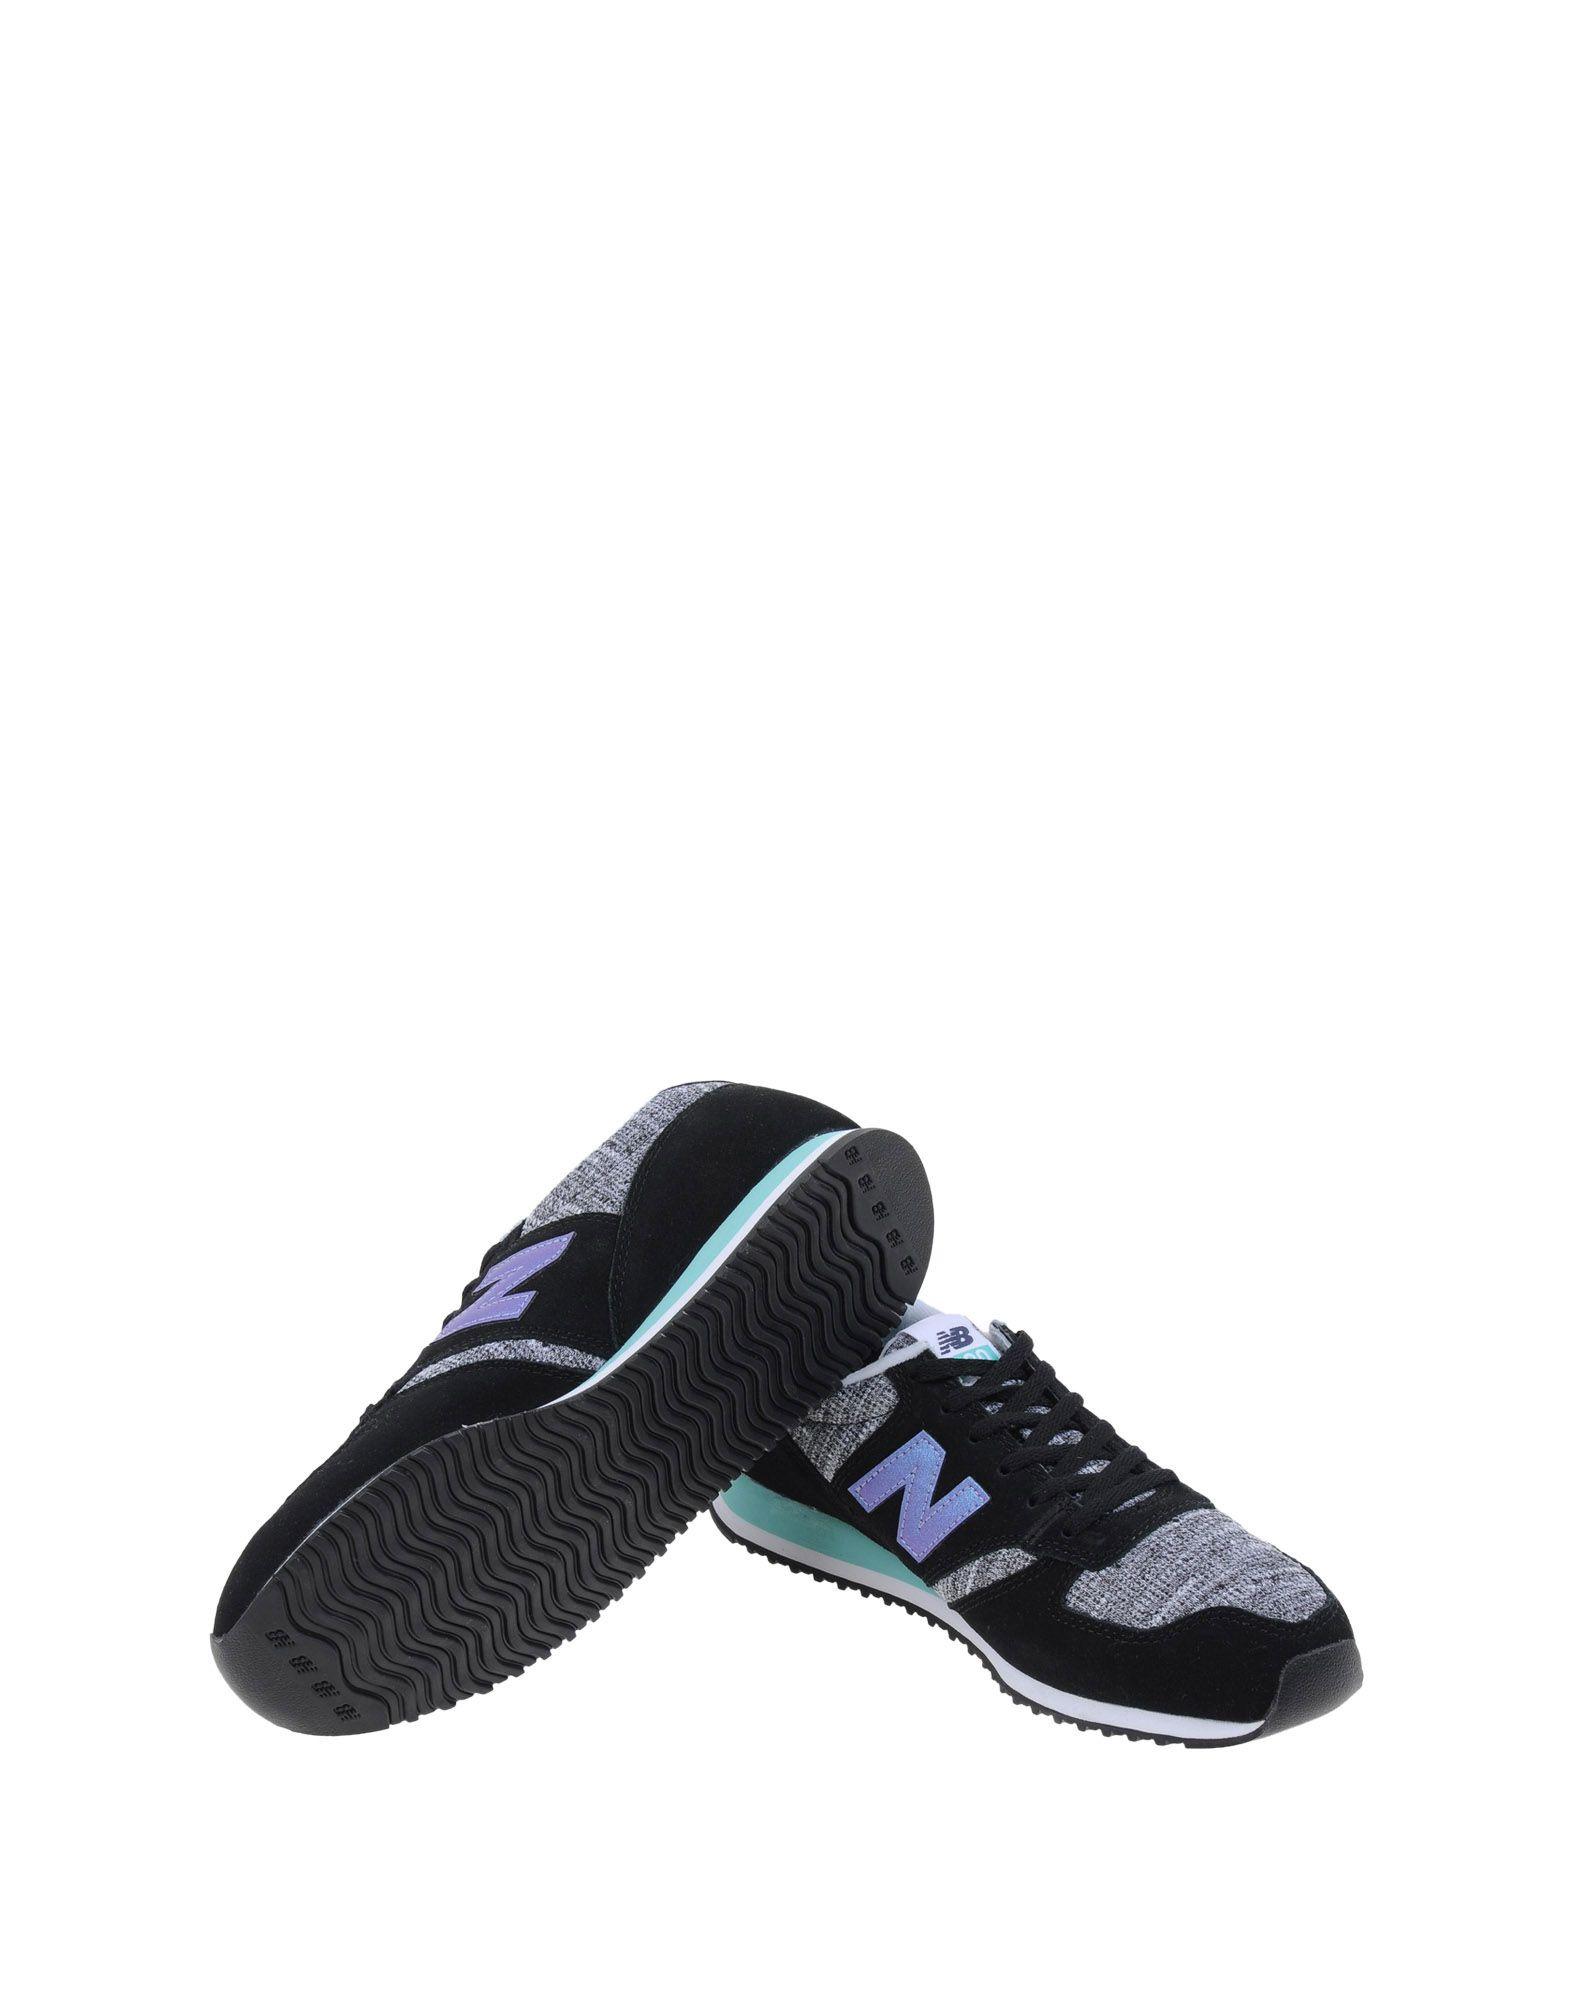 New Balance 420 Qualität Womens Printed Lining  11089247MH Gute Qualität 420 beliebte Schuhe 17287c